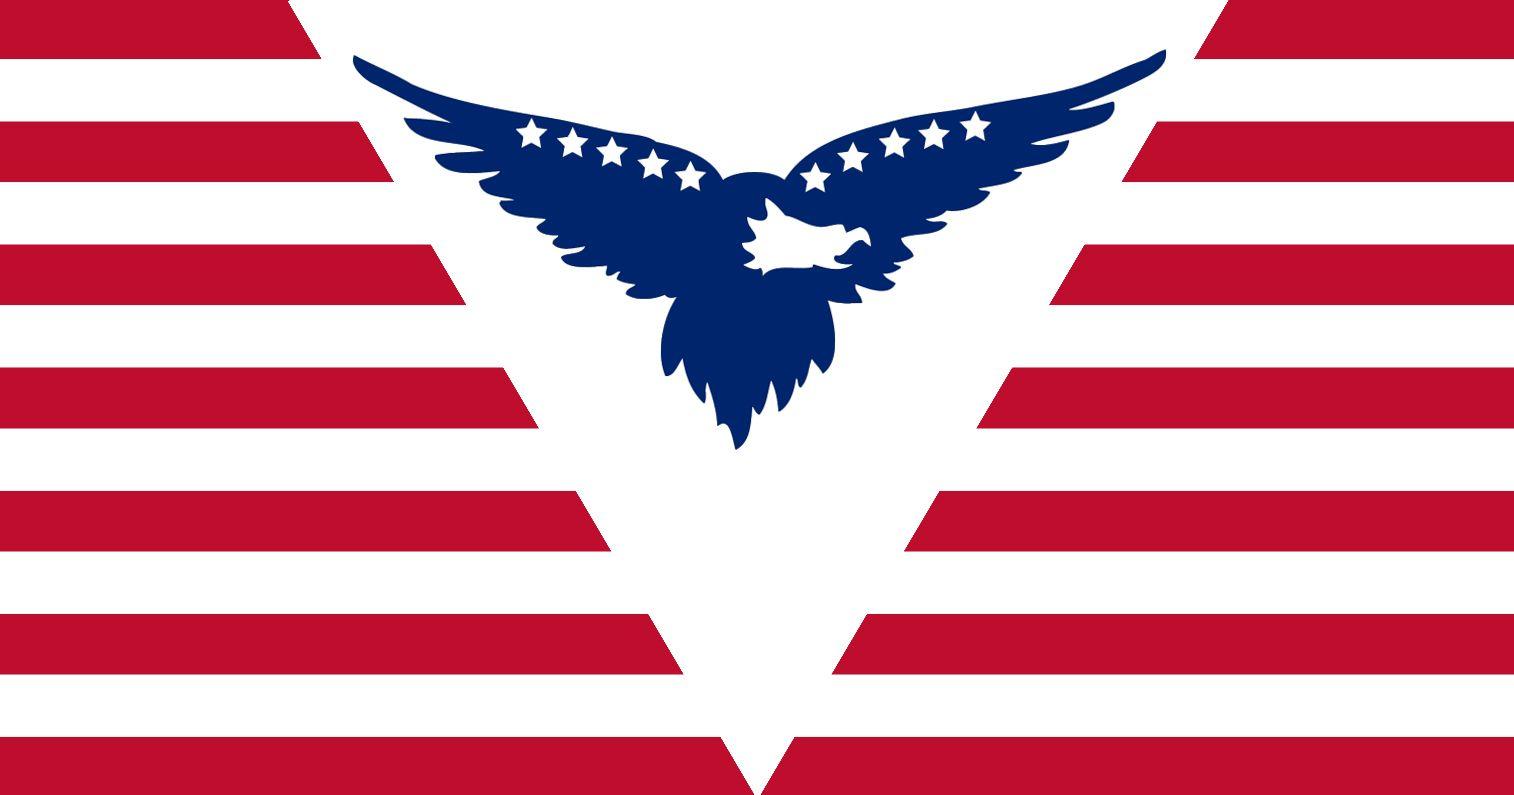 Cool Flag Designs